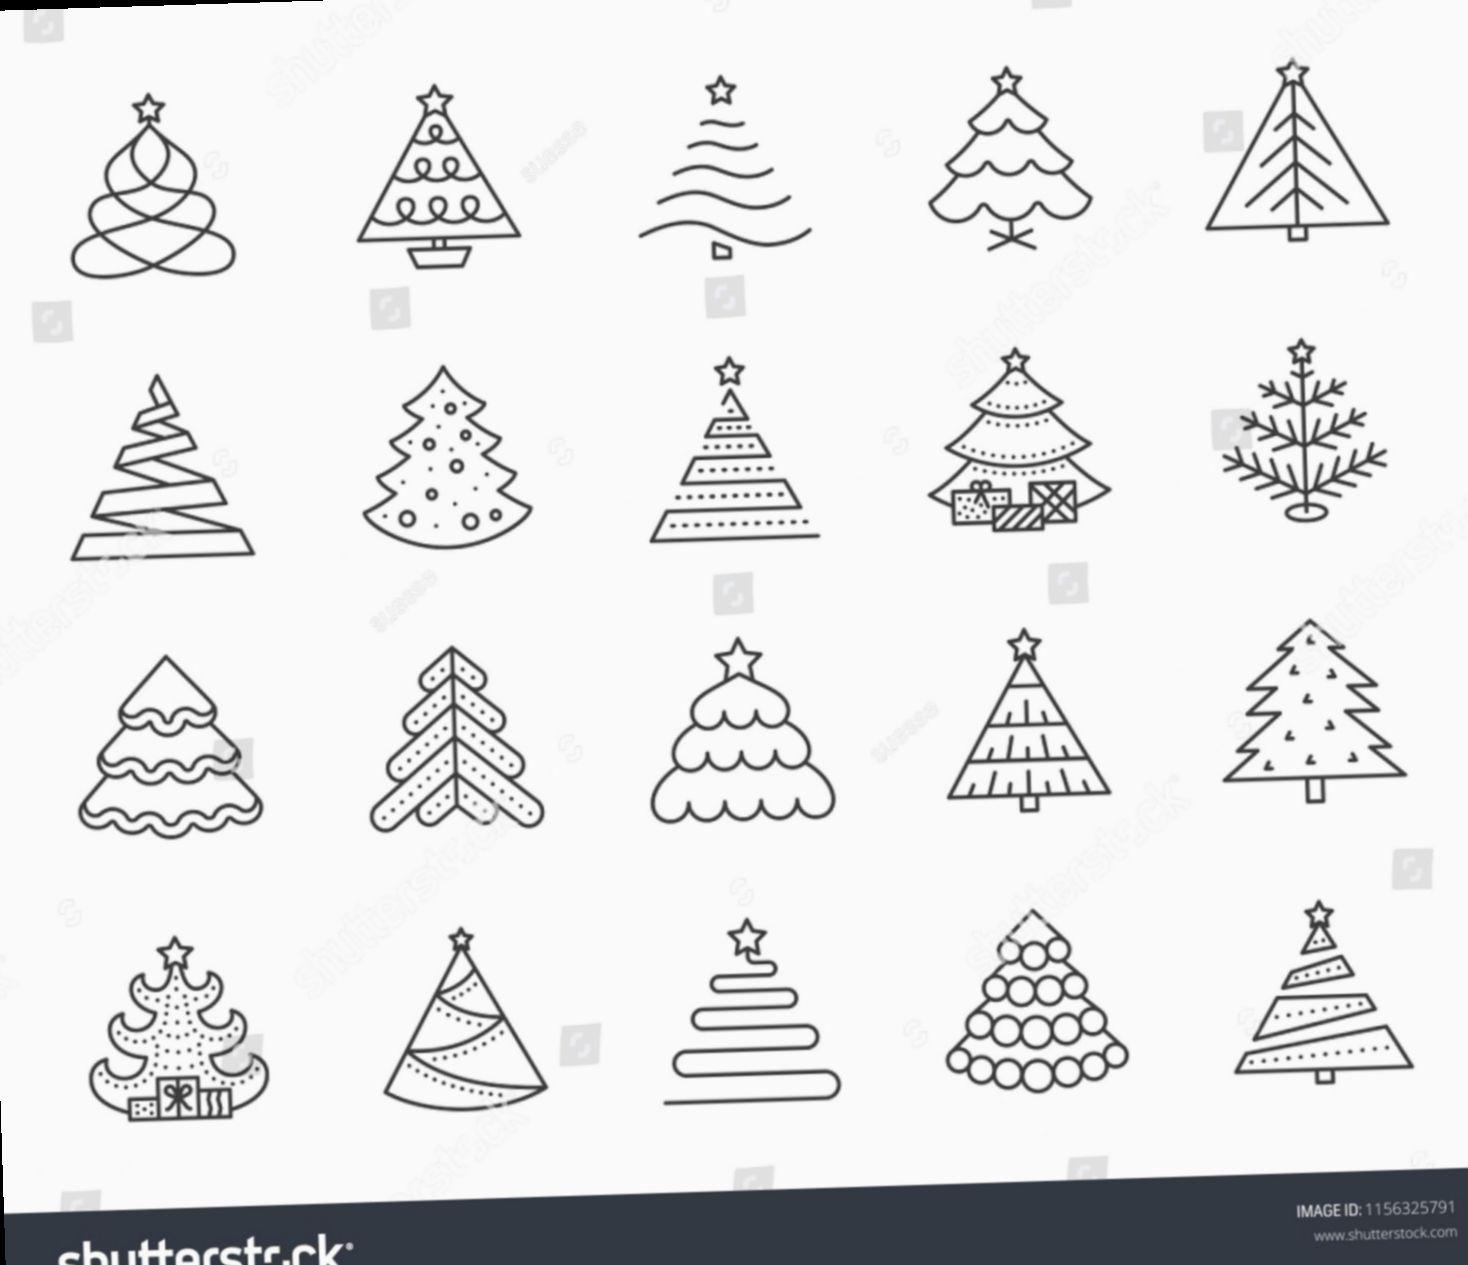 8 Christmas Tree Simple Elegant In 2020 Christmas Tree Drawing Christmas Tree Painting Simple Christmas Tree